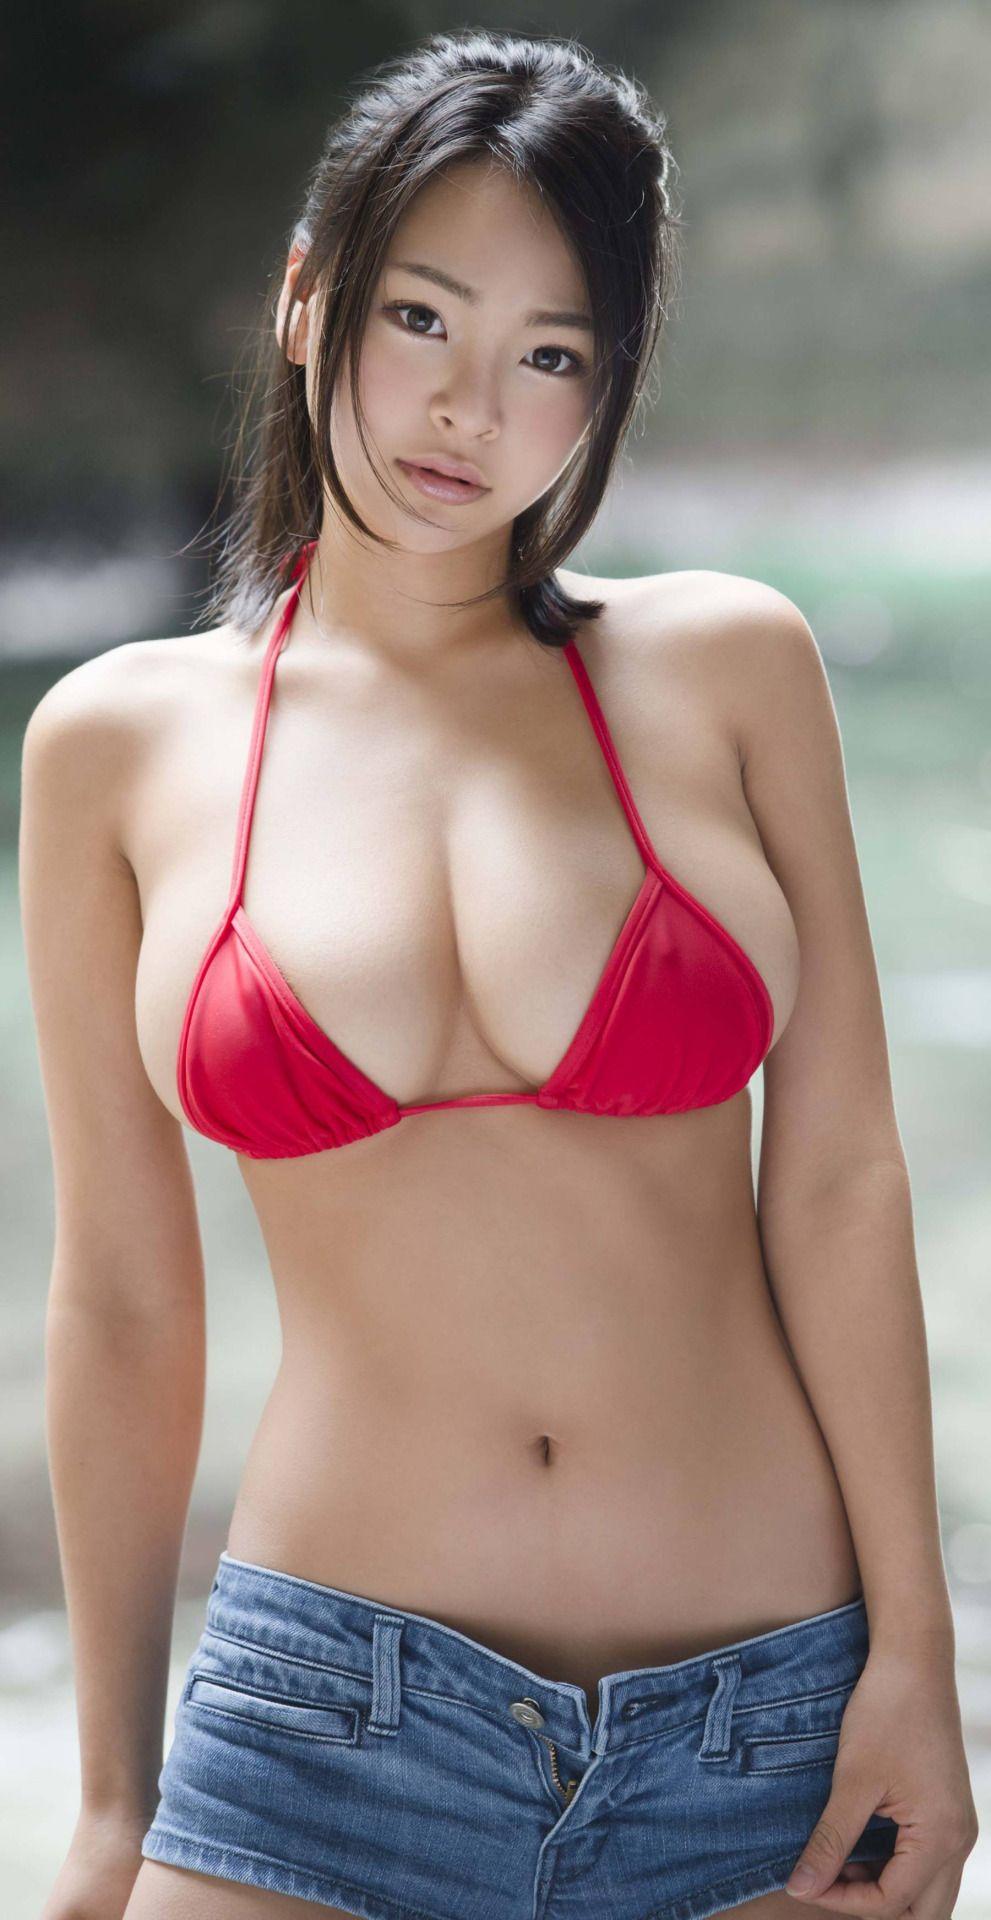 asian schoolgirls photos leaked